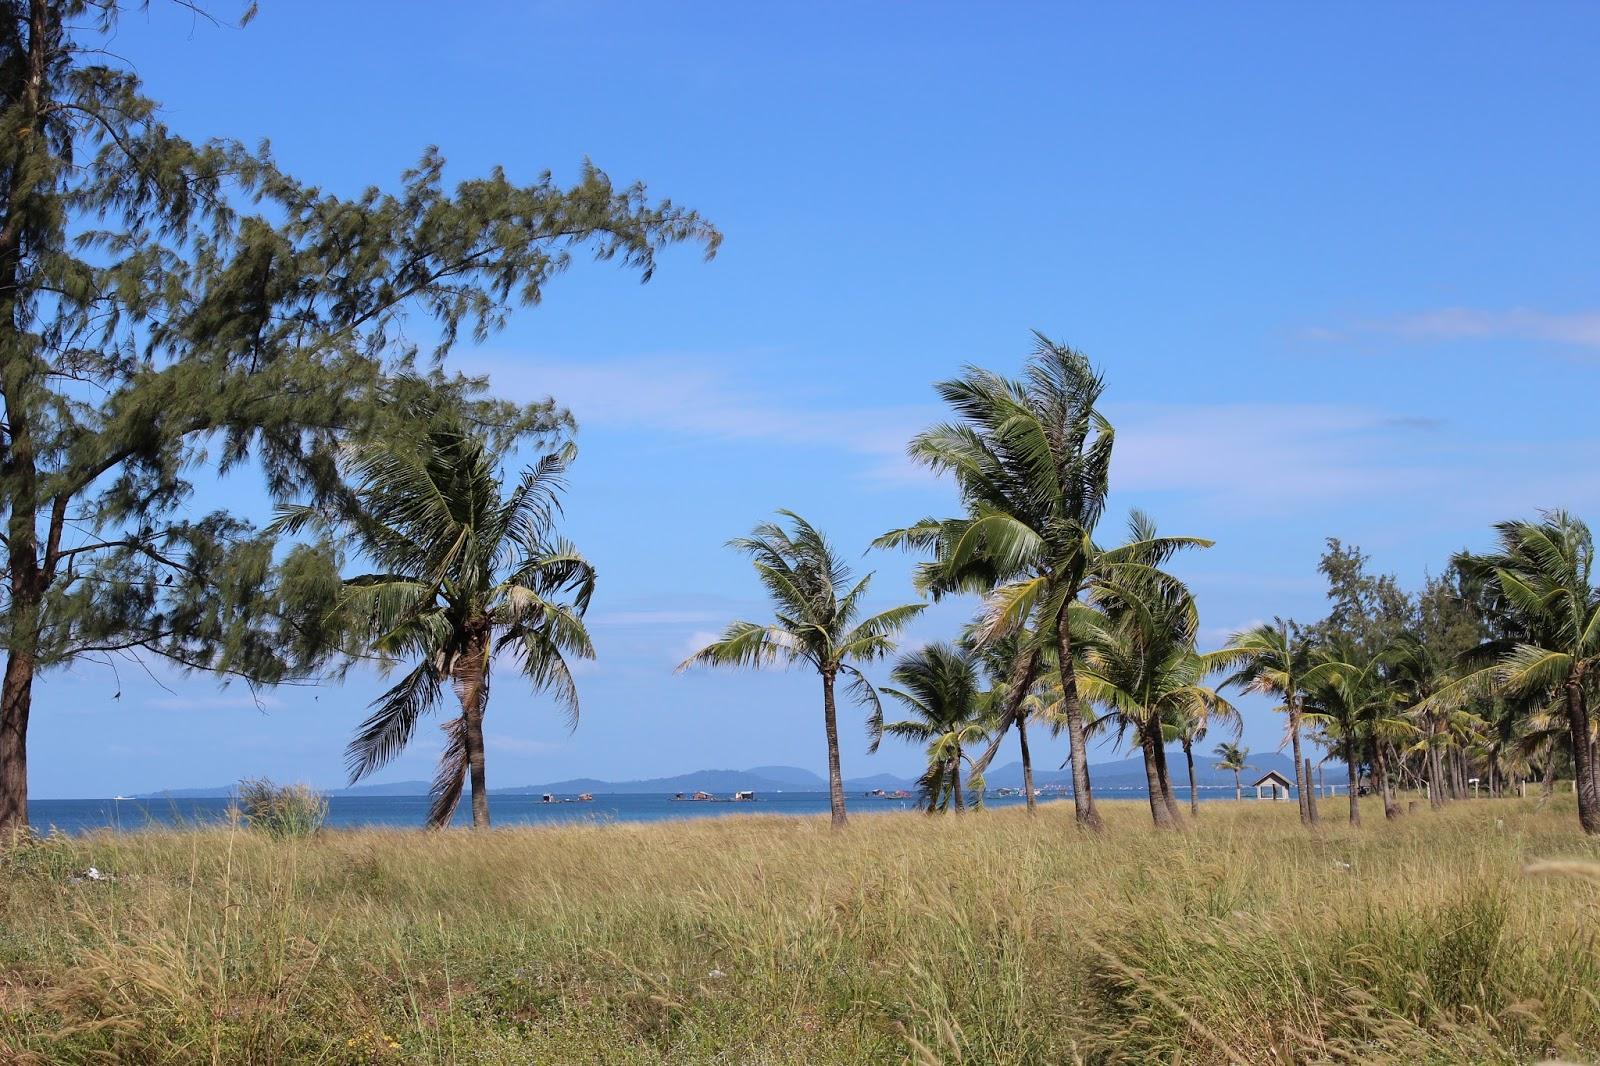 Phu Quoc palm trees